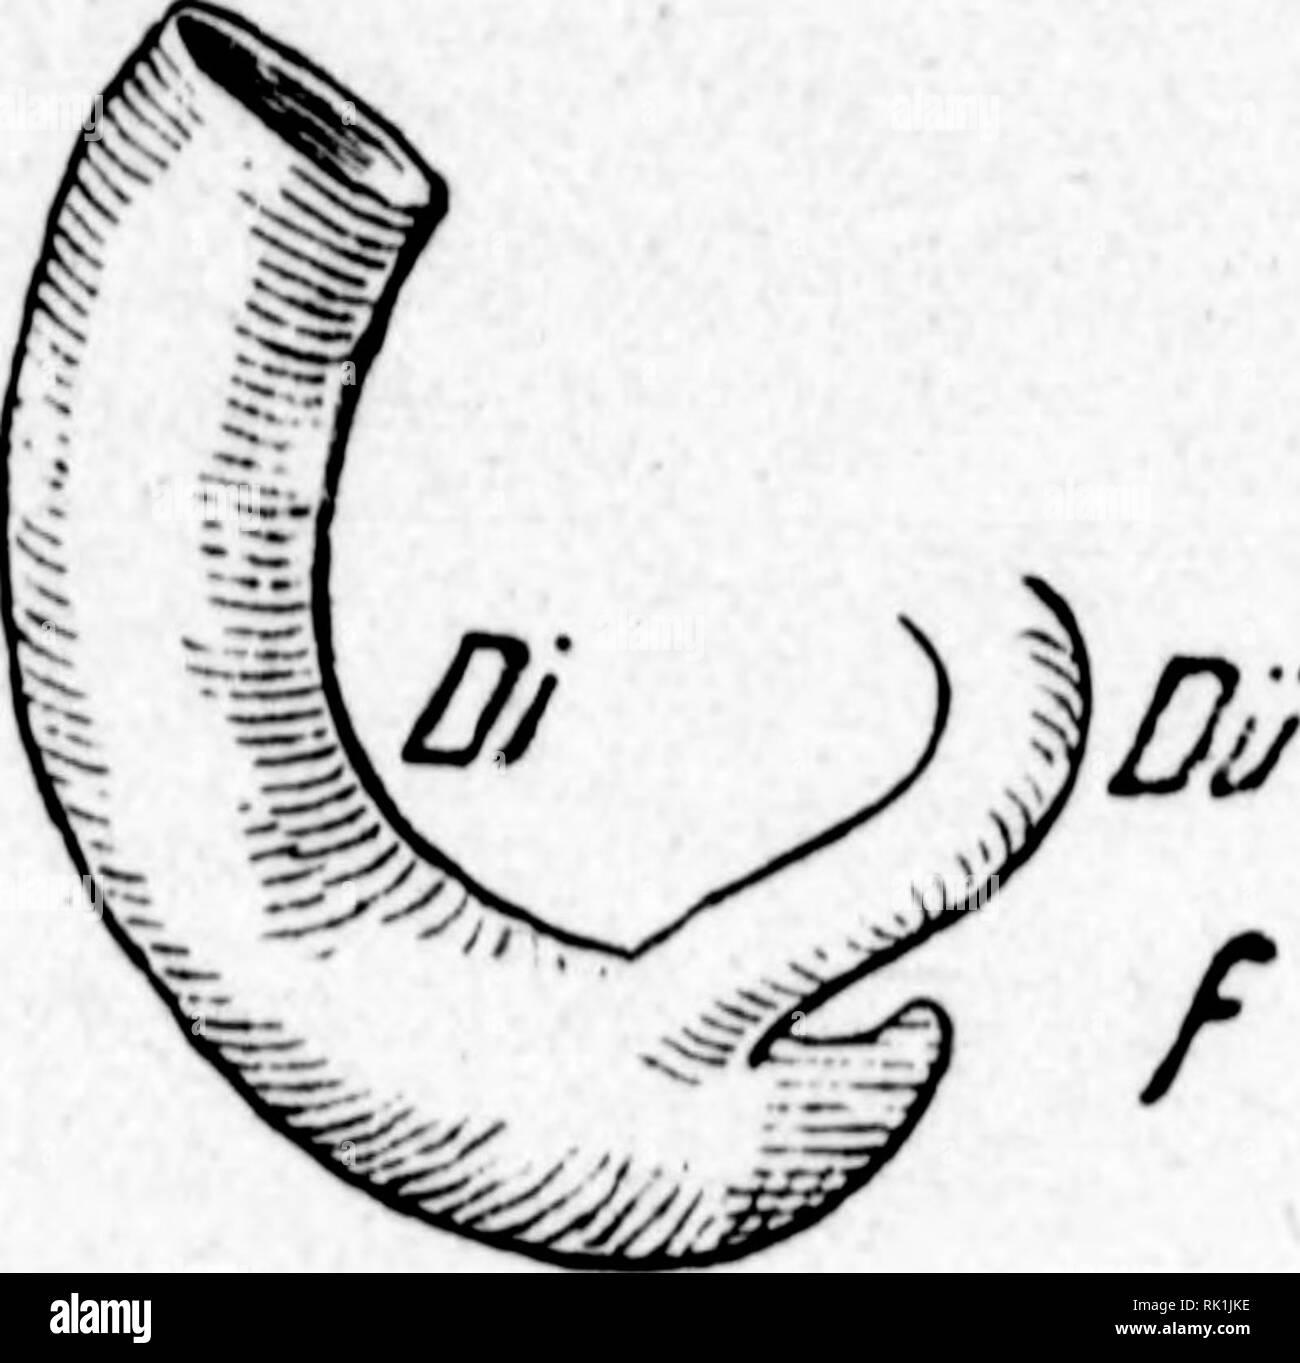 ". Arthur and Fritz Kahn Collection 1889-1932. Kahn, Fritz 1888-1968; Kahn, Arthur David 1850-1928; Natural history illustrators; Natural history. S15&. 6. JRücTdilbunfl hc^ 5>Iinbbirnt^. a iMinbbarm Beim 3?iefcn(änQuru^ b ^albnffcrt, c Ornnß, d men[cf)Uc^en 6mbil)o, e cc»üact)feiien äJienfdien, f bei bcc AlaVe. Oiait) äxJtcberööeim unb Mlaatfct).) bretö"" leidjt übetjeiigen lann, bcn 5D^agen um ba^ 3cf)nfQrI)e fe.ne^ 33innenraumeg. 33ei bcn 33euteltiercn, bie mir 511 ben bireften 3Sorfo{)reri be^ SOJcnfcljen rccl)ncii müifcn, crreidjt et in ein5elneu gäücn boö iSoppclte ber Sörperlä - Stock Image"